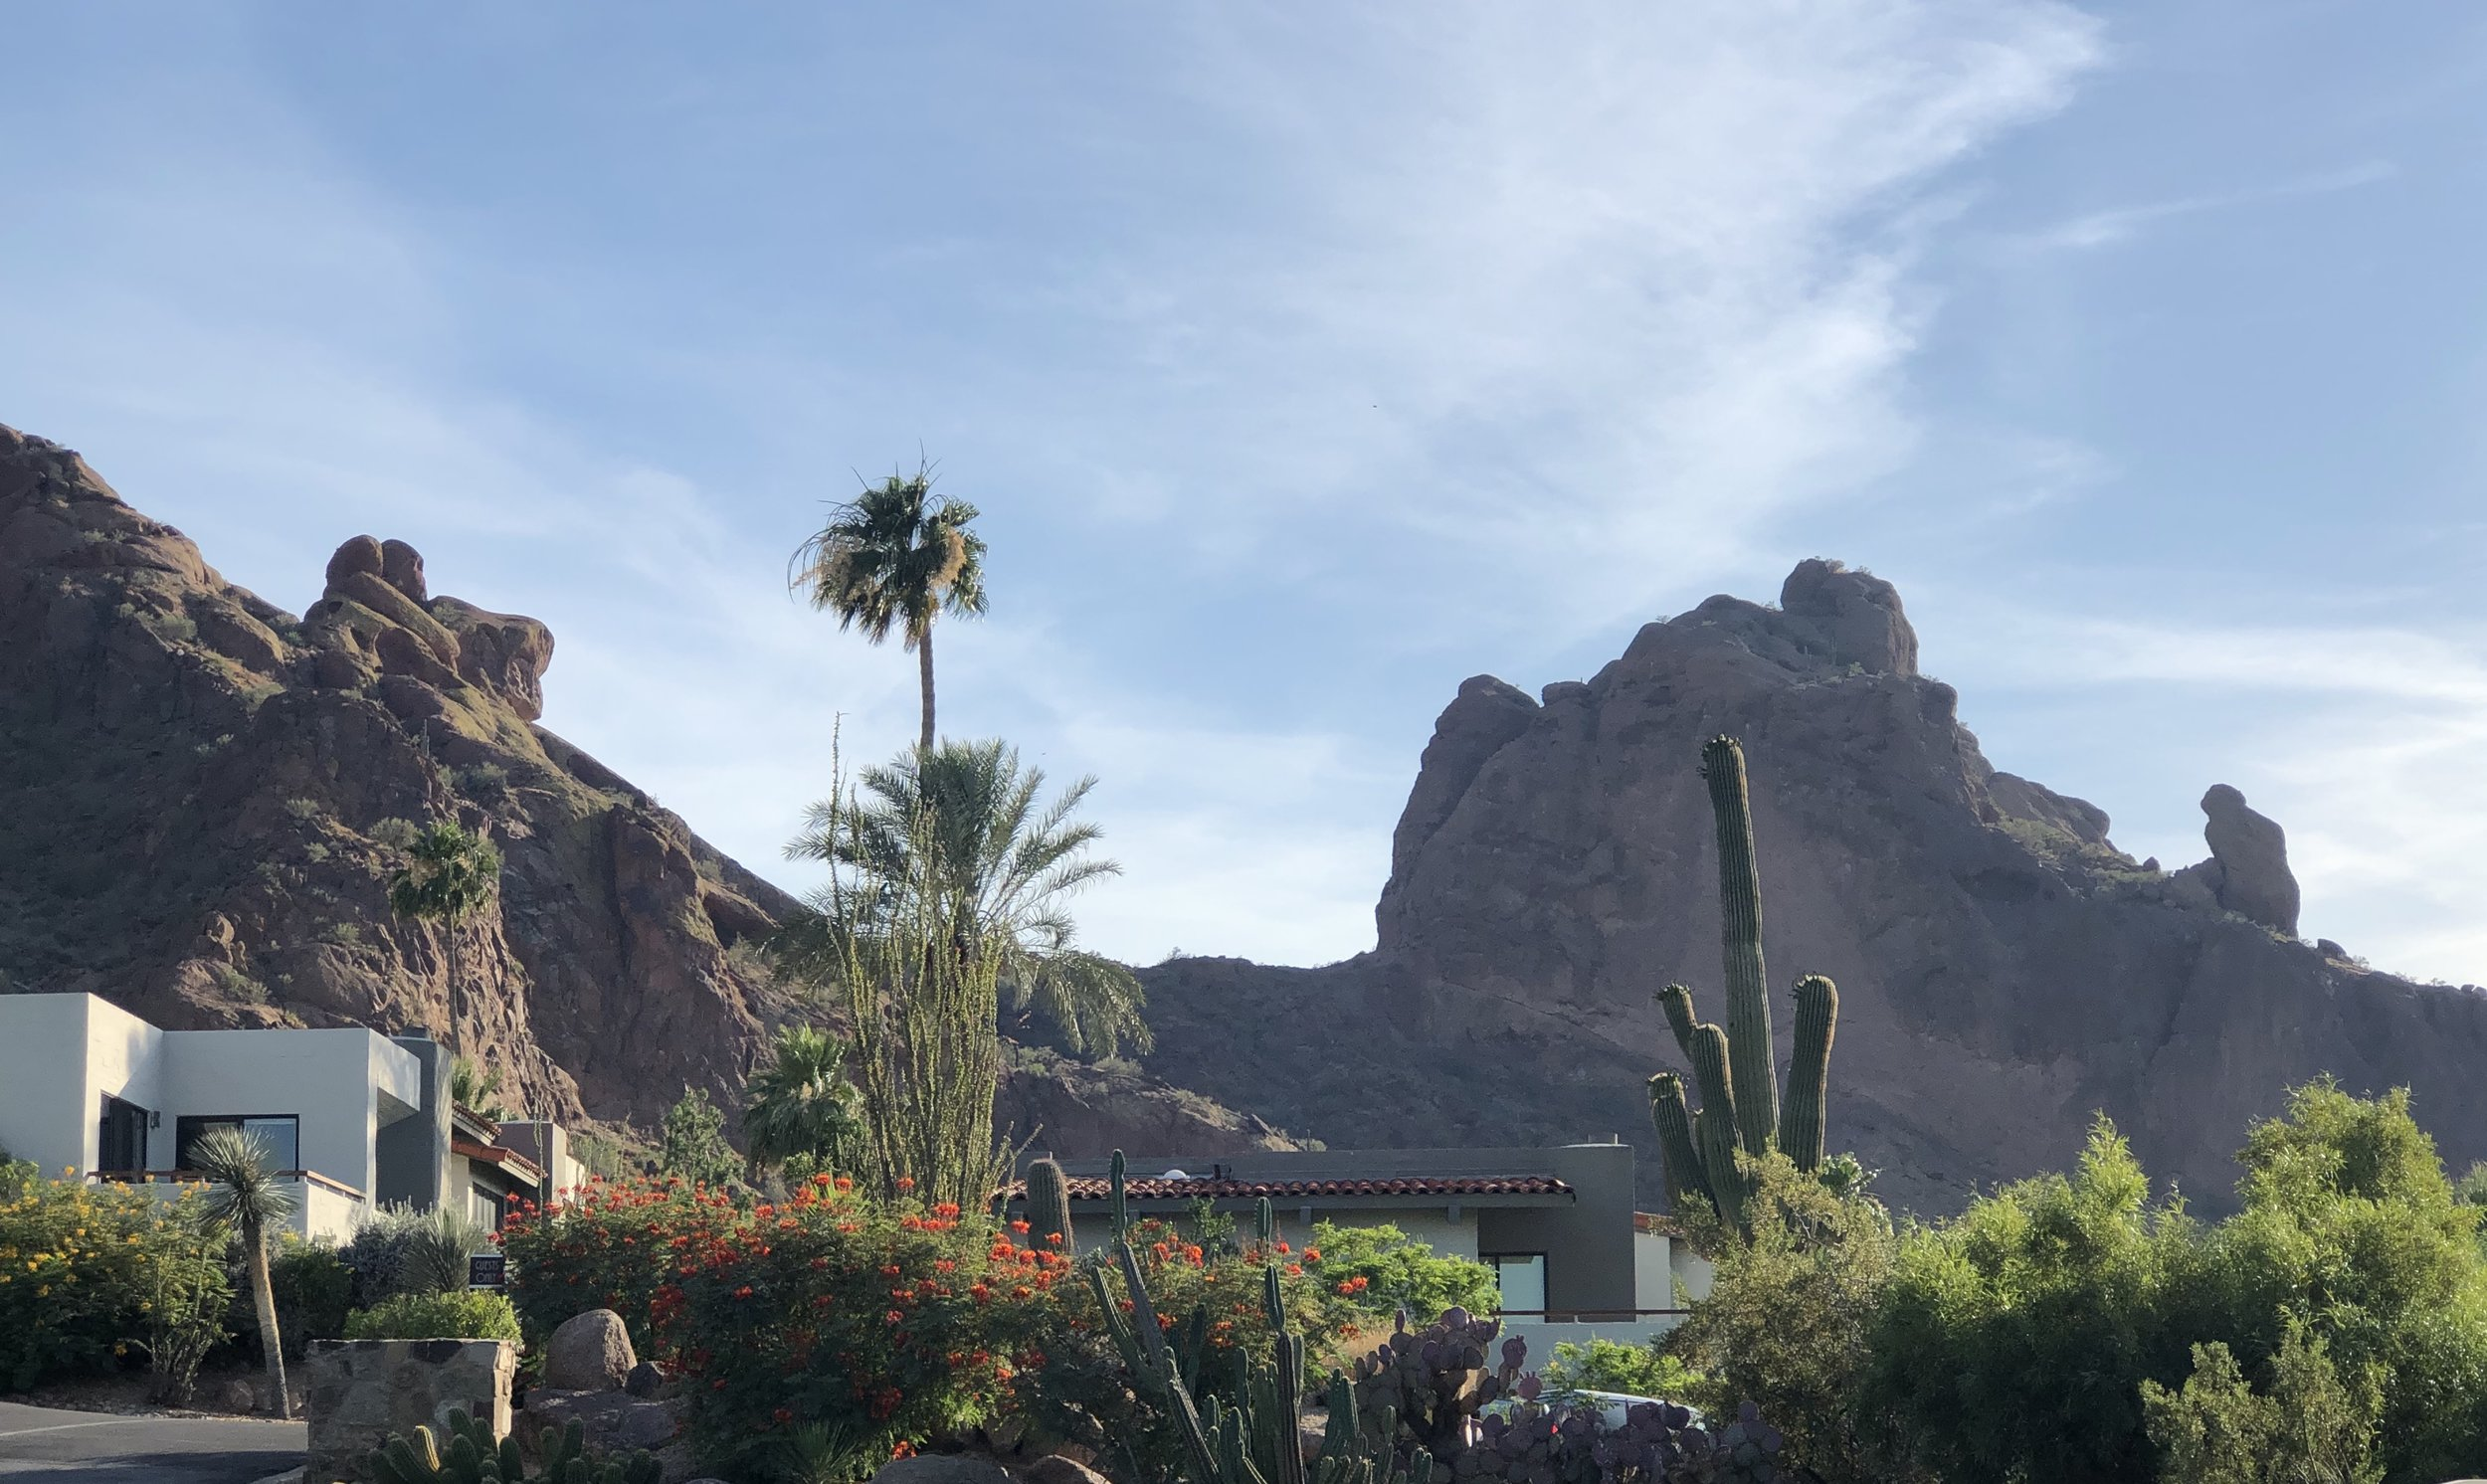 Wanderlust-travel-blog-scottsdale-arizona-travel